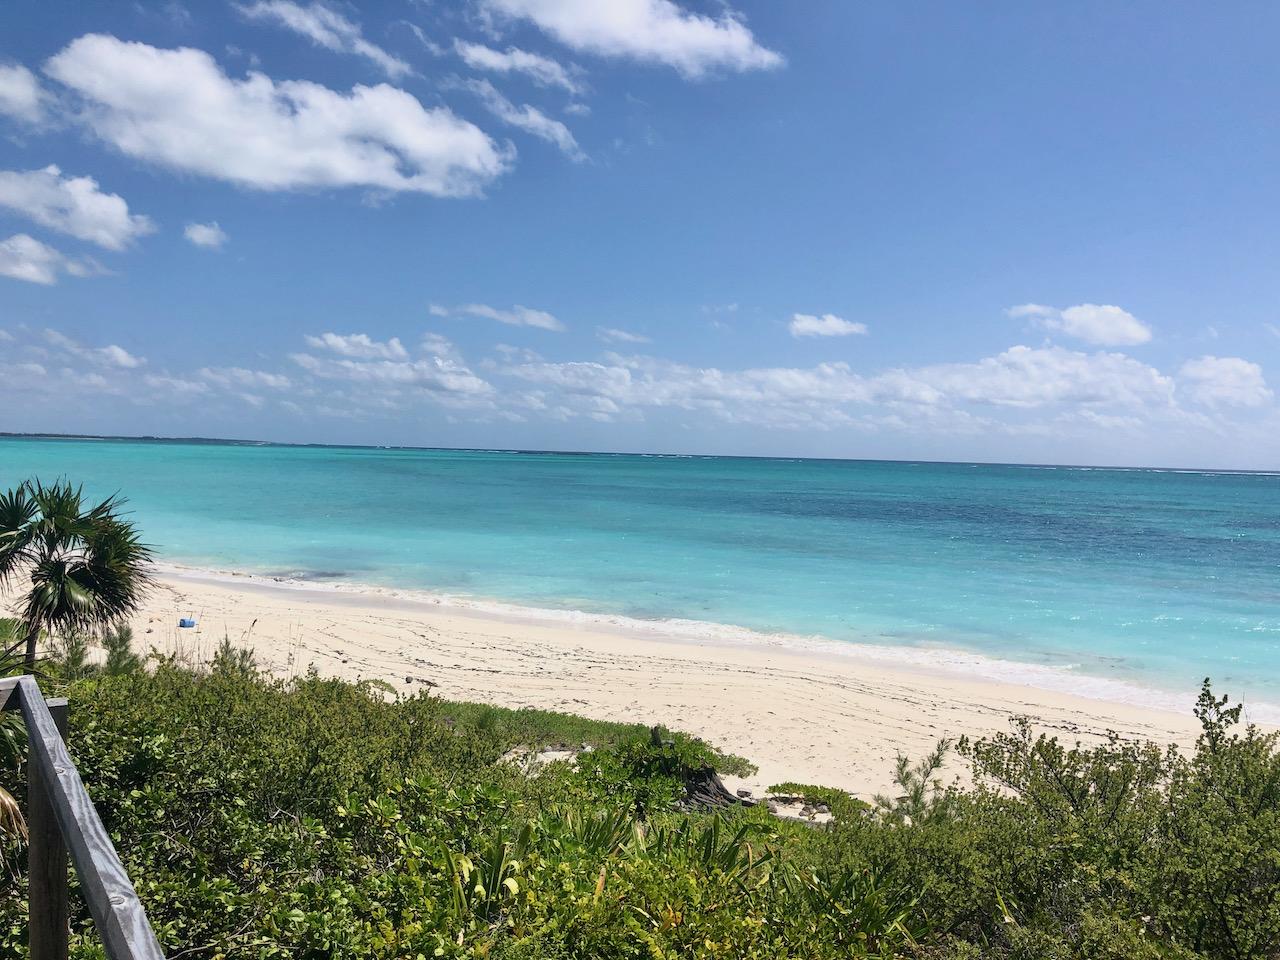 bahama-palm-shores-beachfront-home-for-sale-10